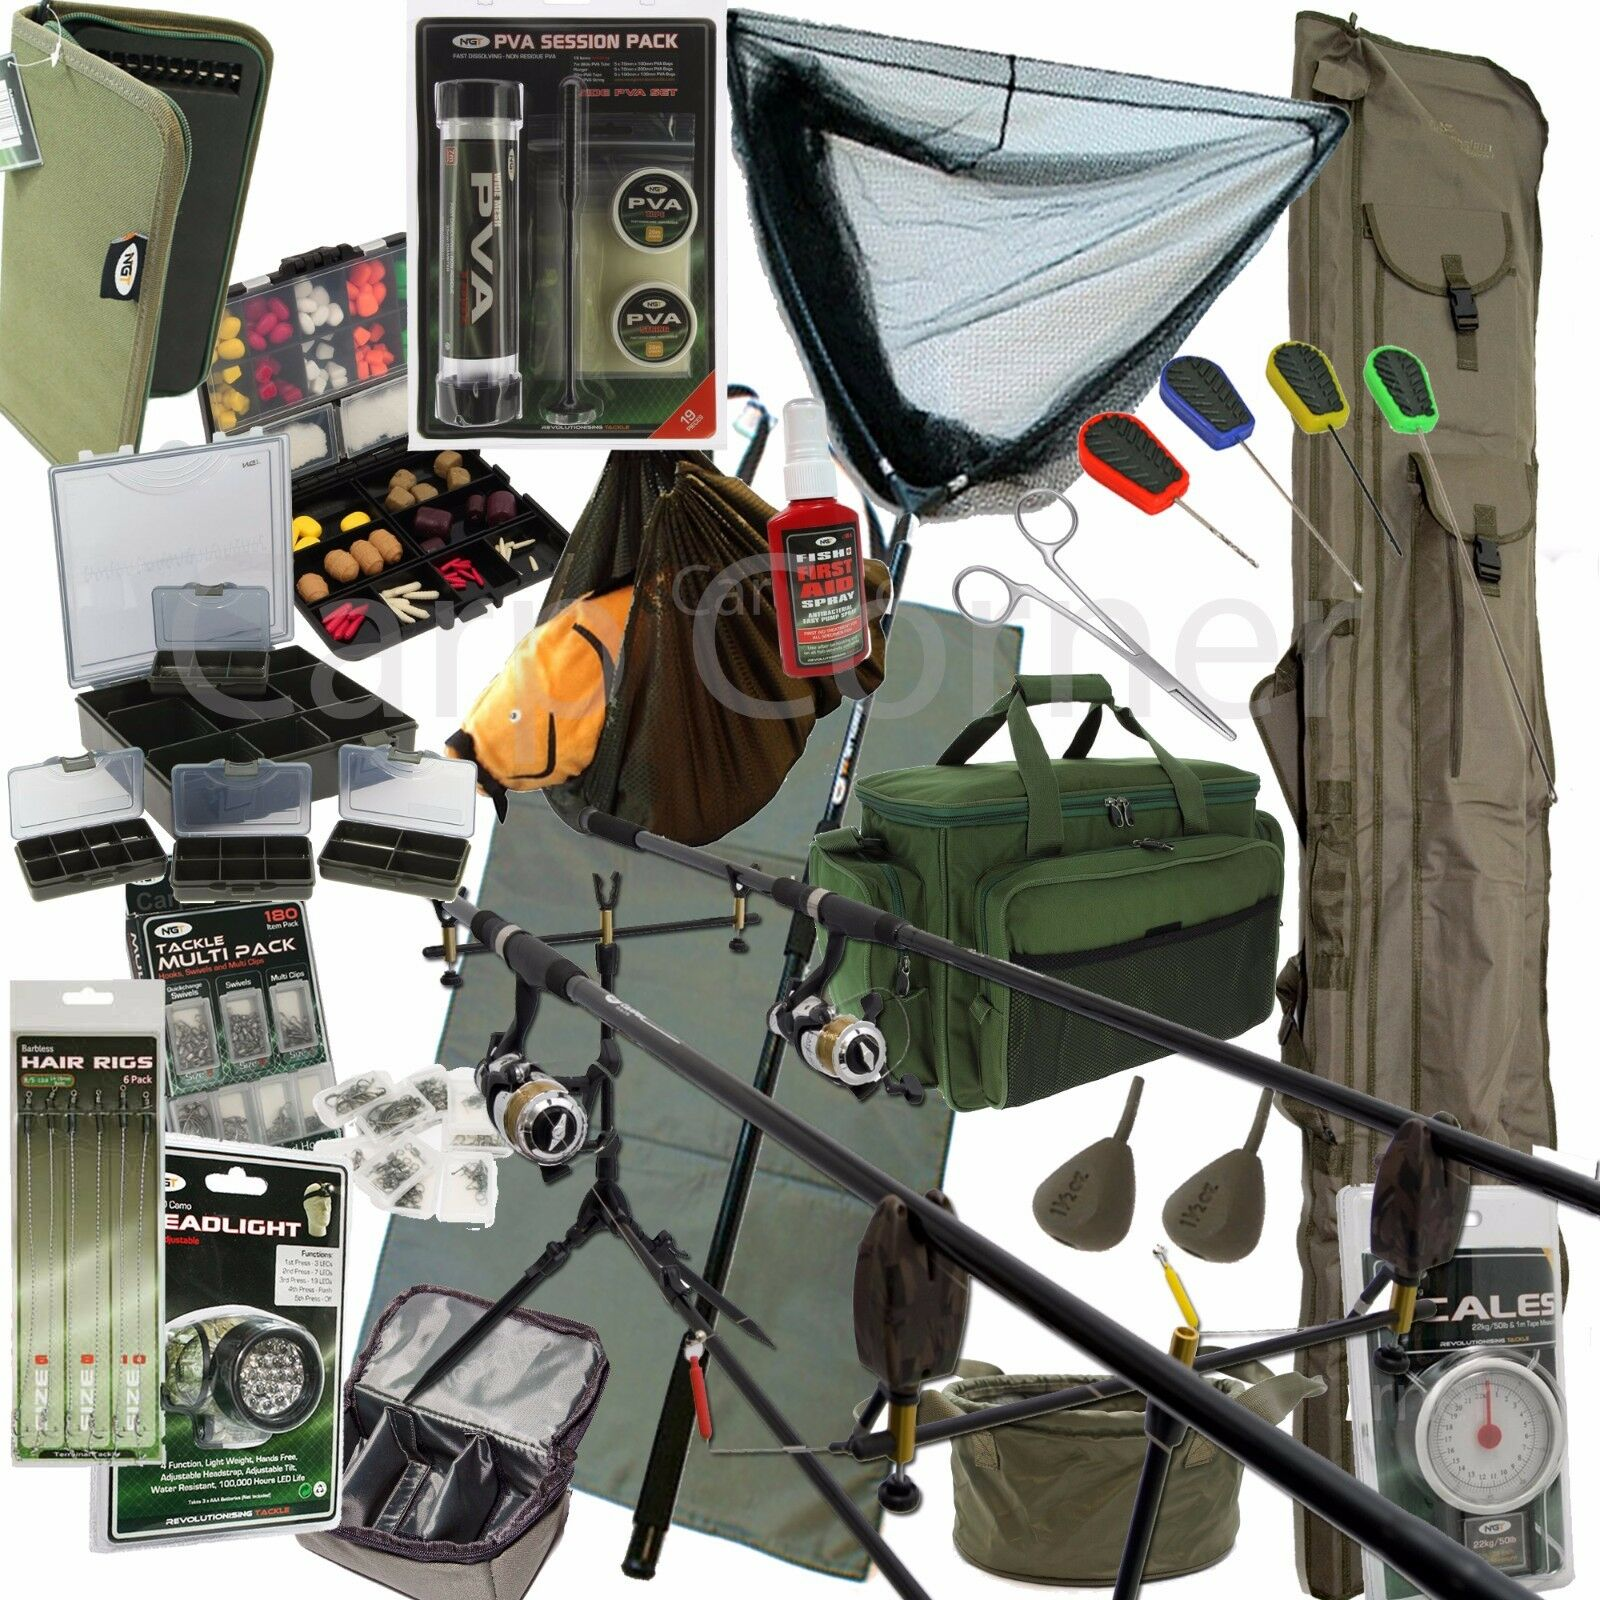 Komplett Karpfenangeln Anordnung Anordnung Anordnung + 3 Ruten Rollen Alarm Koffer Gerät Reisetasche d2b5e9